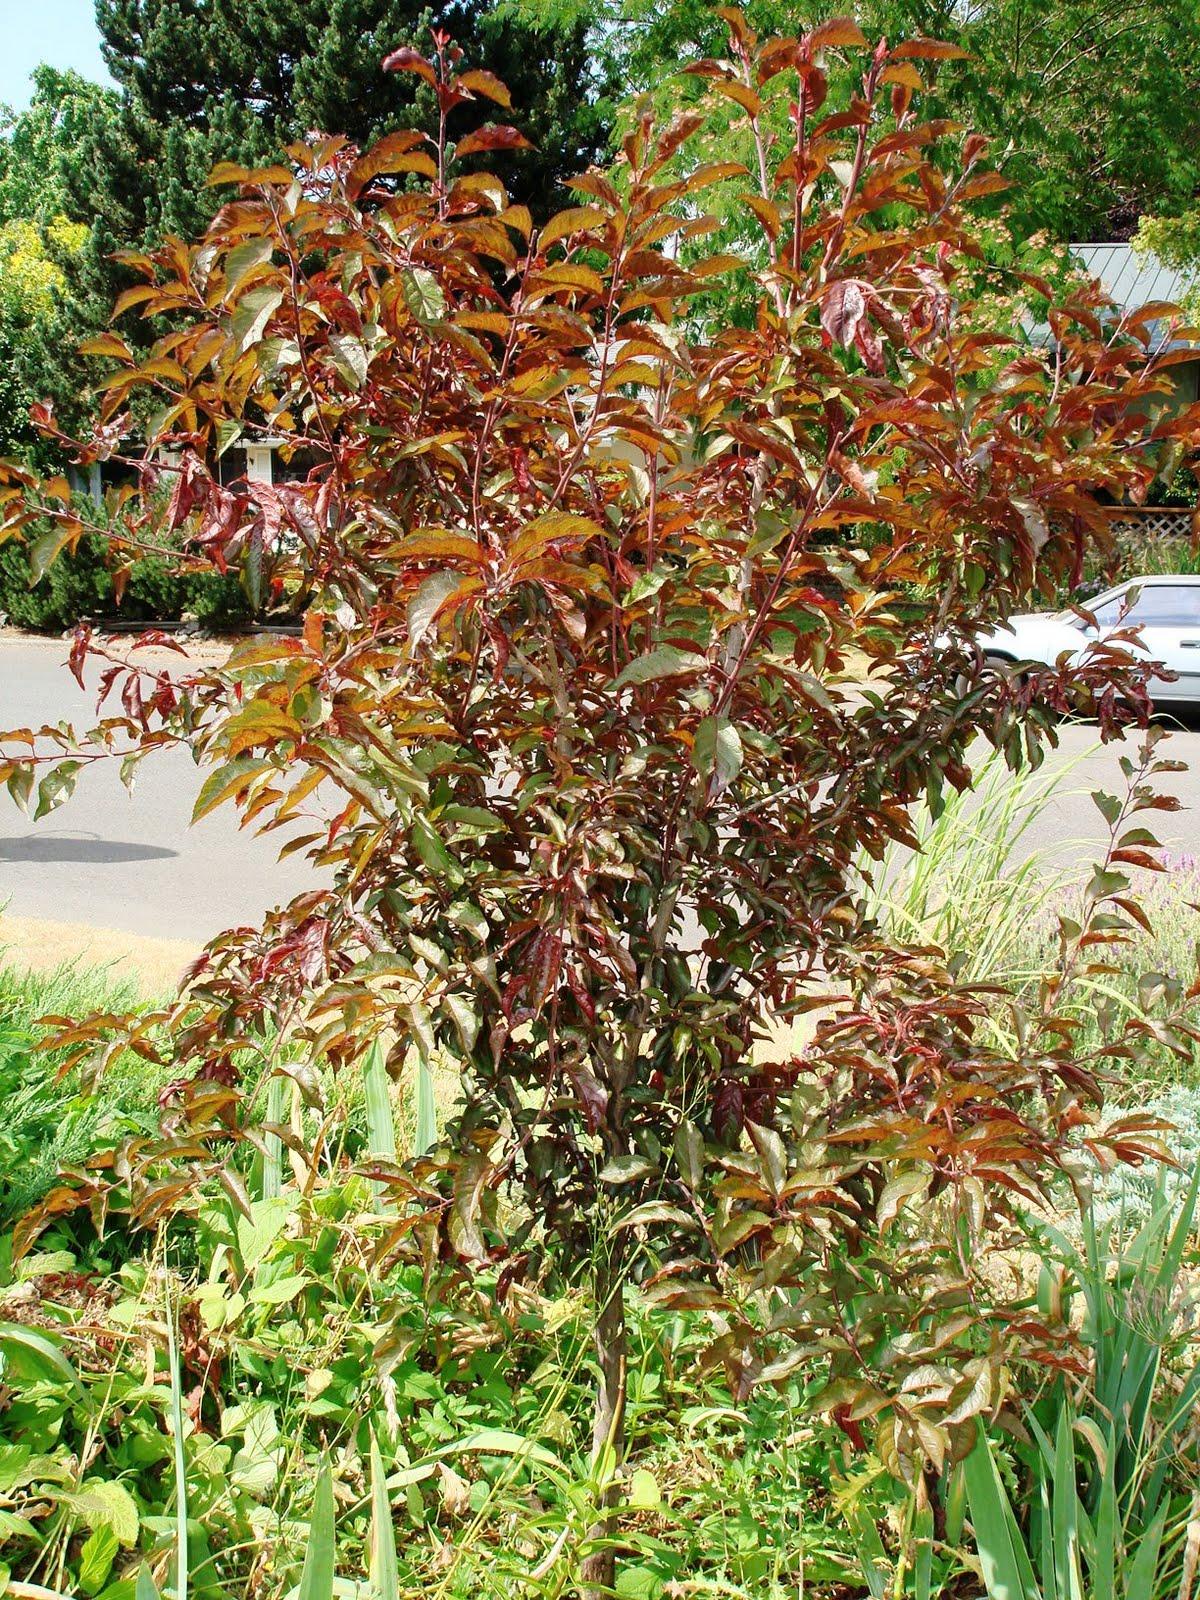 Growing Greener in the Pacific Northwest: More Kitchen Garden